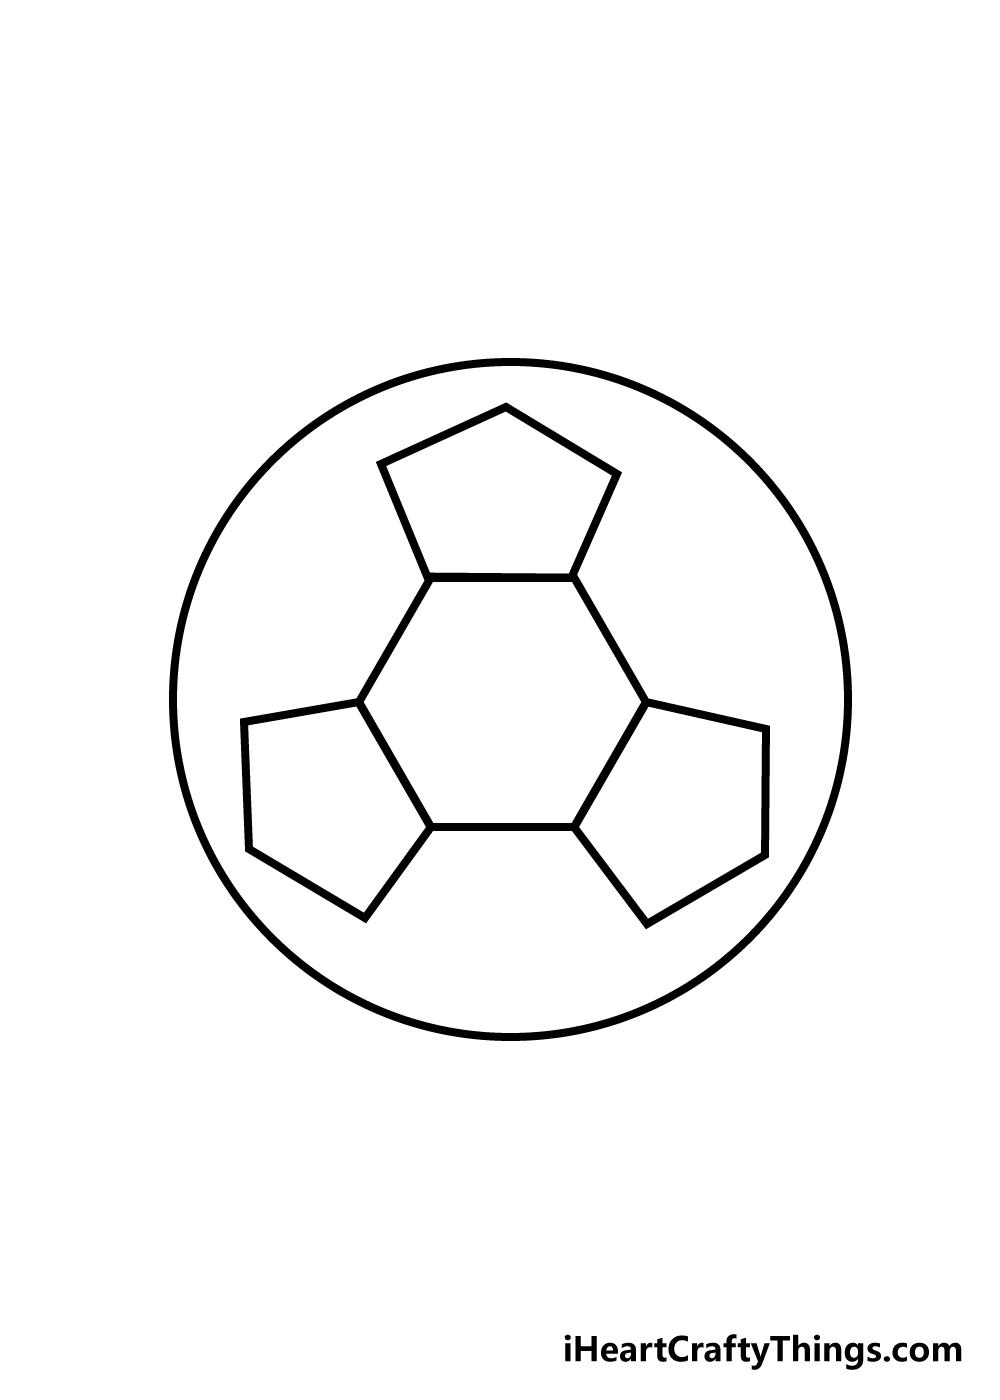 soccer ball drawing step 3